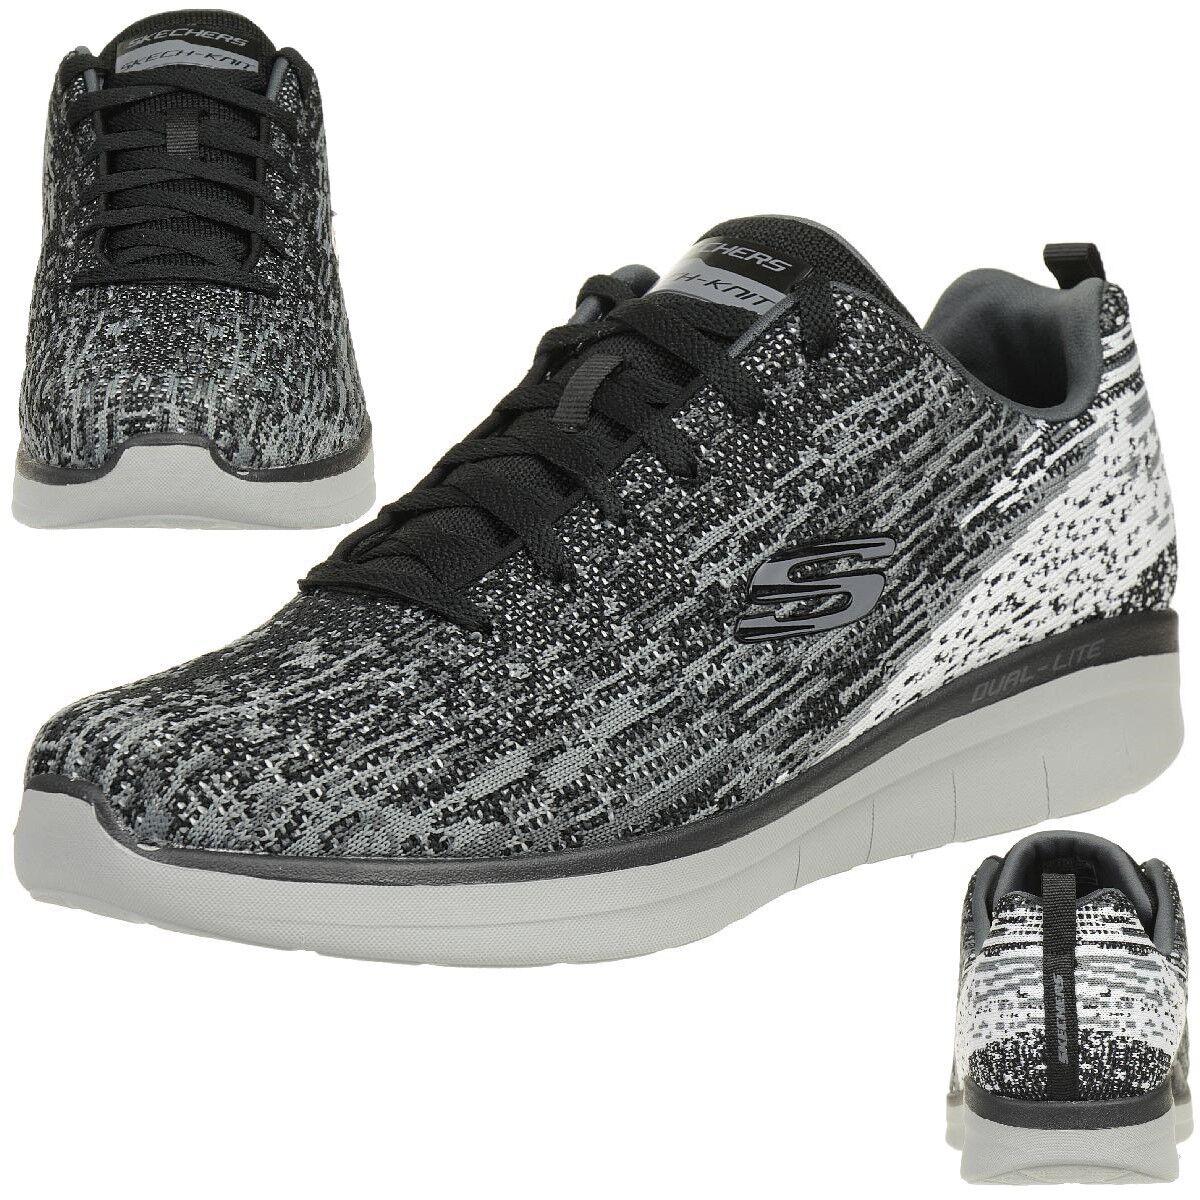 Skechers Synergy 2.0 calcetines cortos cortos cortos fitness zapatos Lite memory foam bkcc 7b51d5